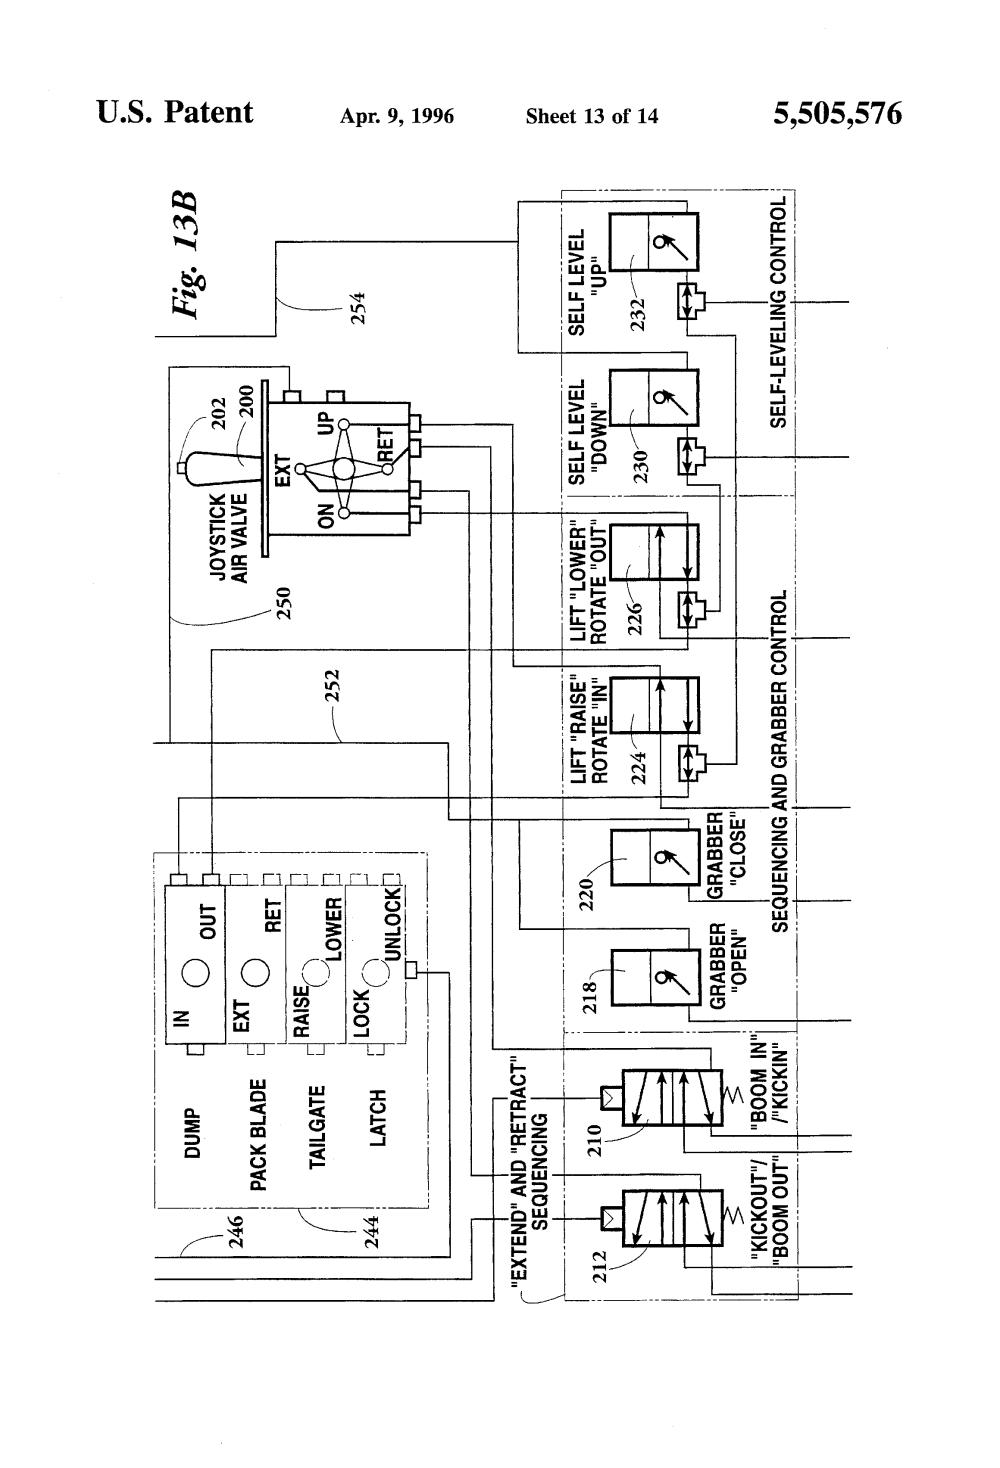 medium resolution of mcneilus wiring diagrams wiring diagram detailed travel trailer wiring schematic mcneilus wiring schematic 1998